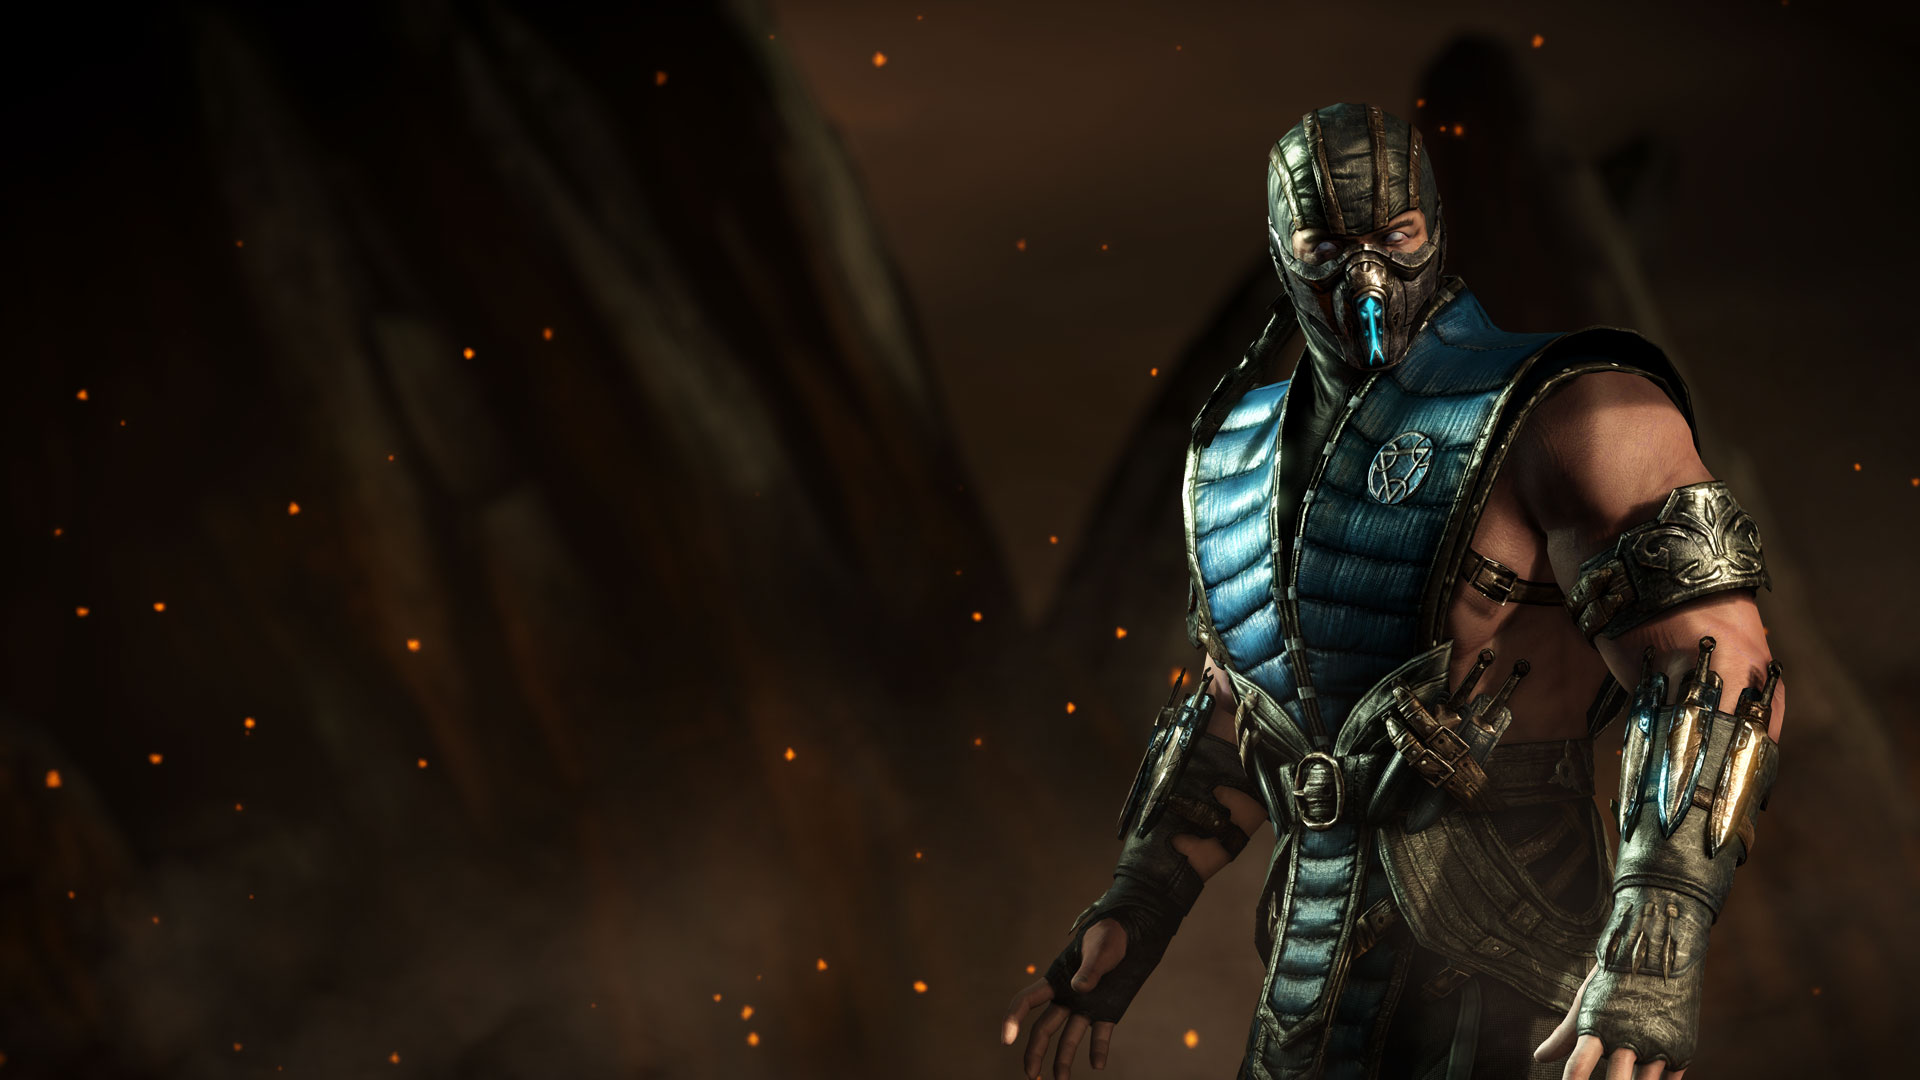 MKWarehouse Mortal Kombat X Sub Zero 1920x1080